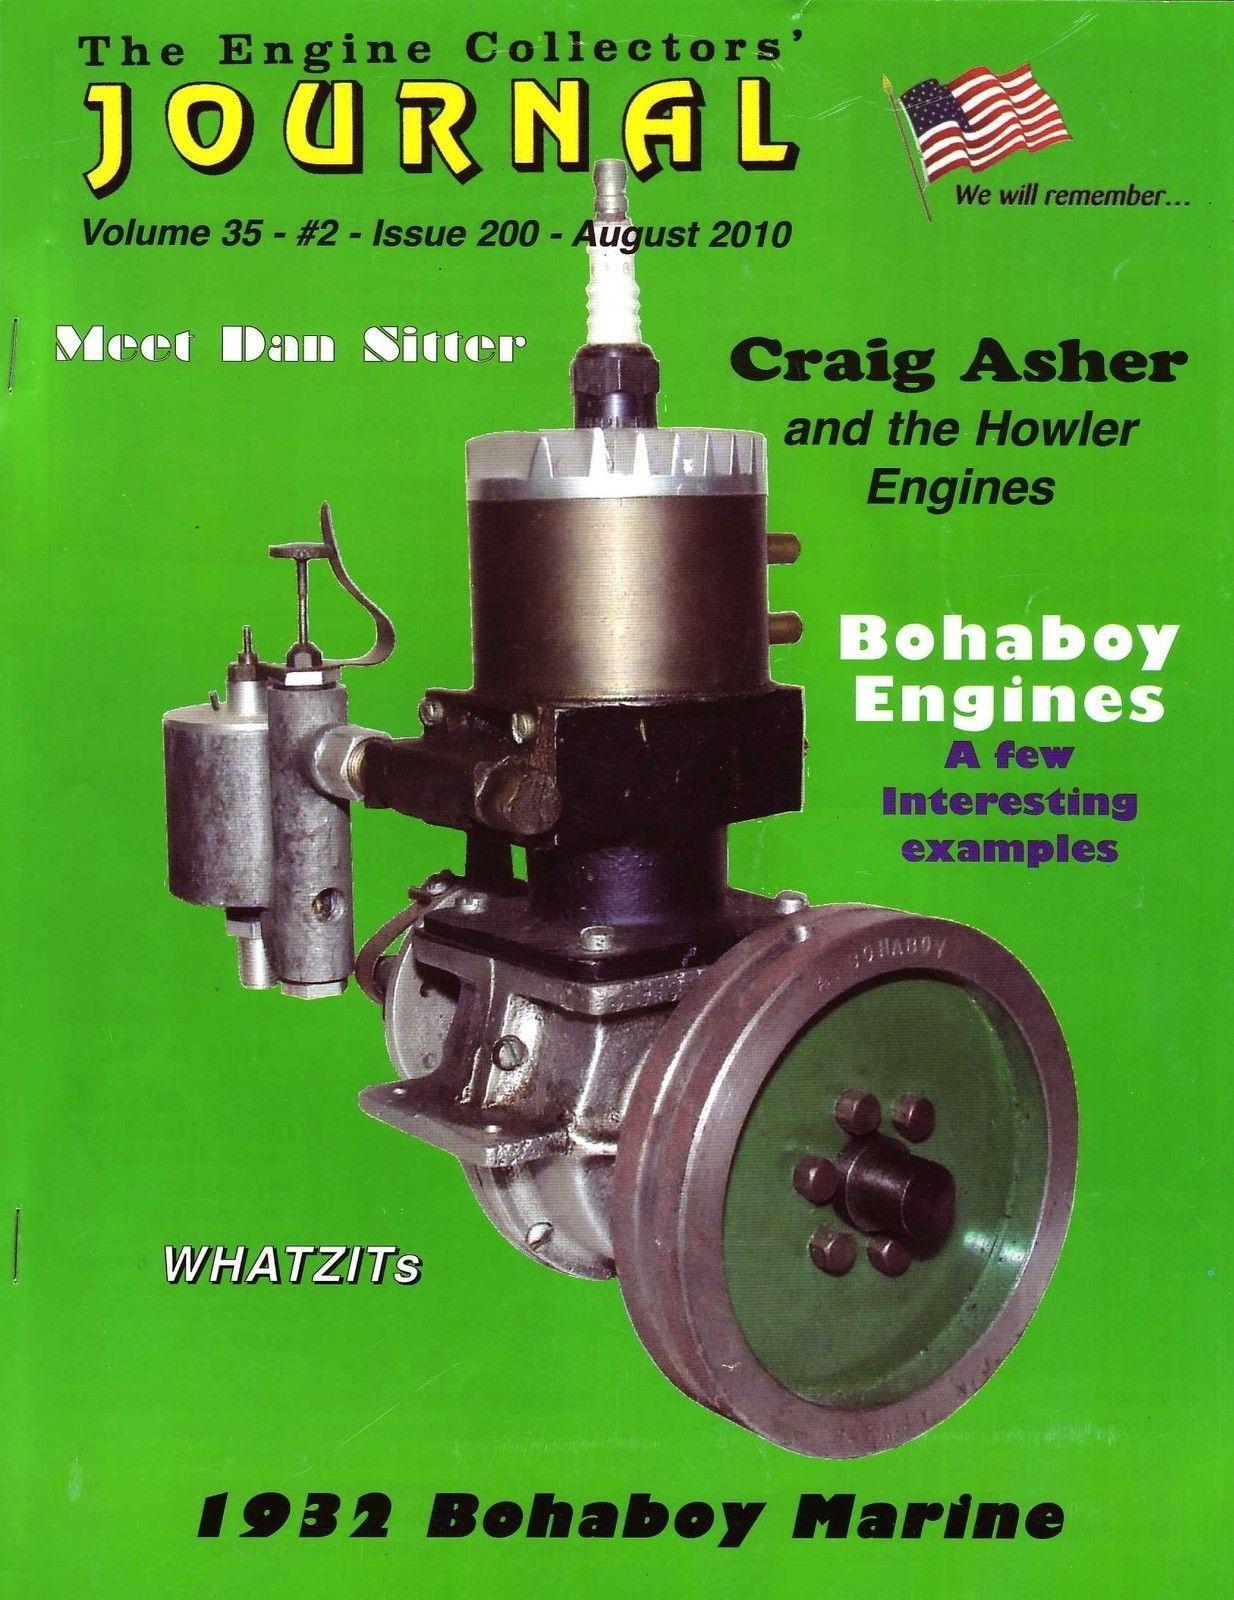 200 Engine Collectors Journal Bohaboy Marine Howler 30cc Mel Anderson Model Engineering Miniature Model Marine